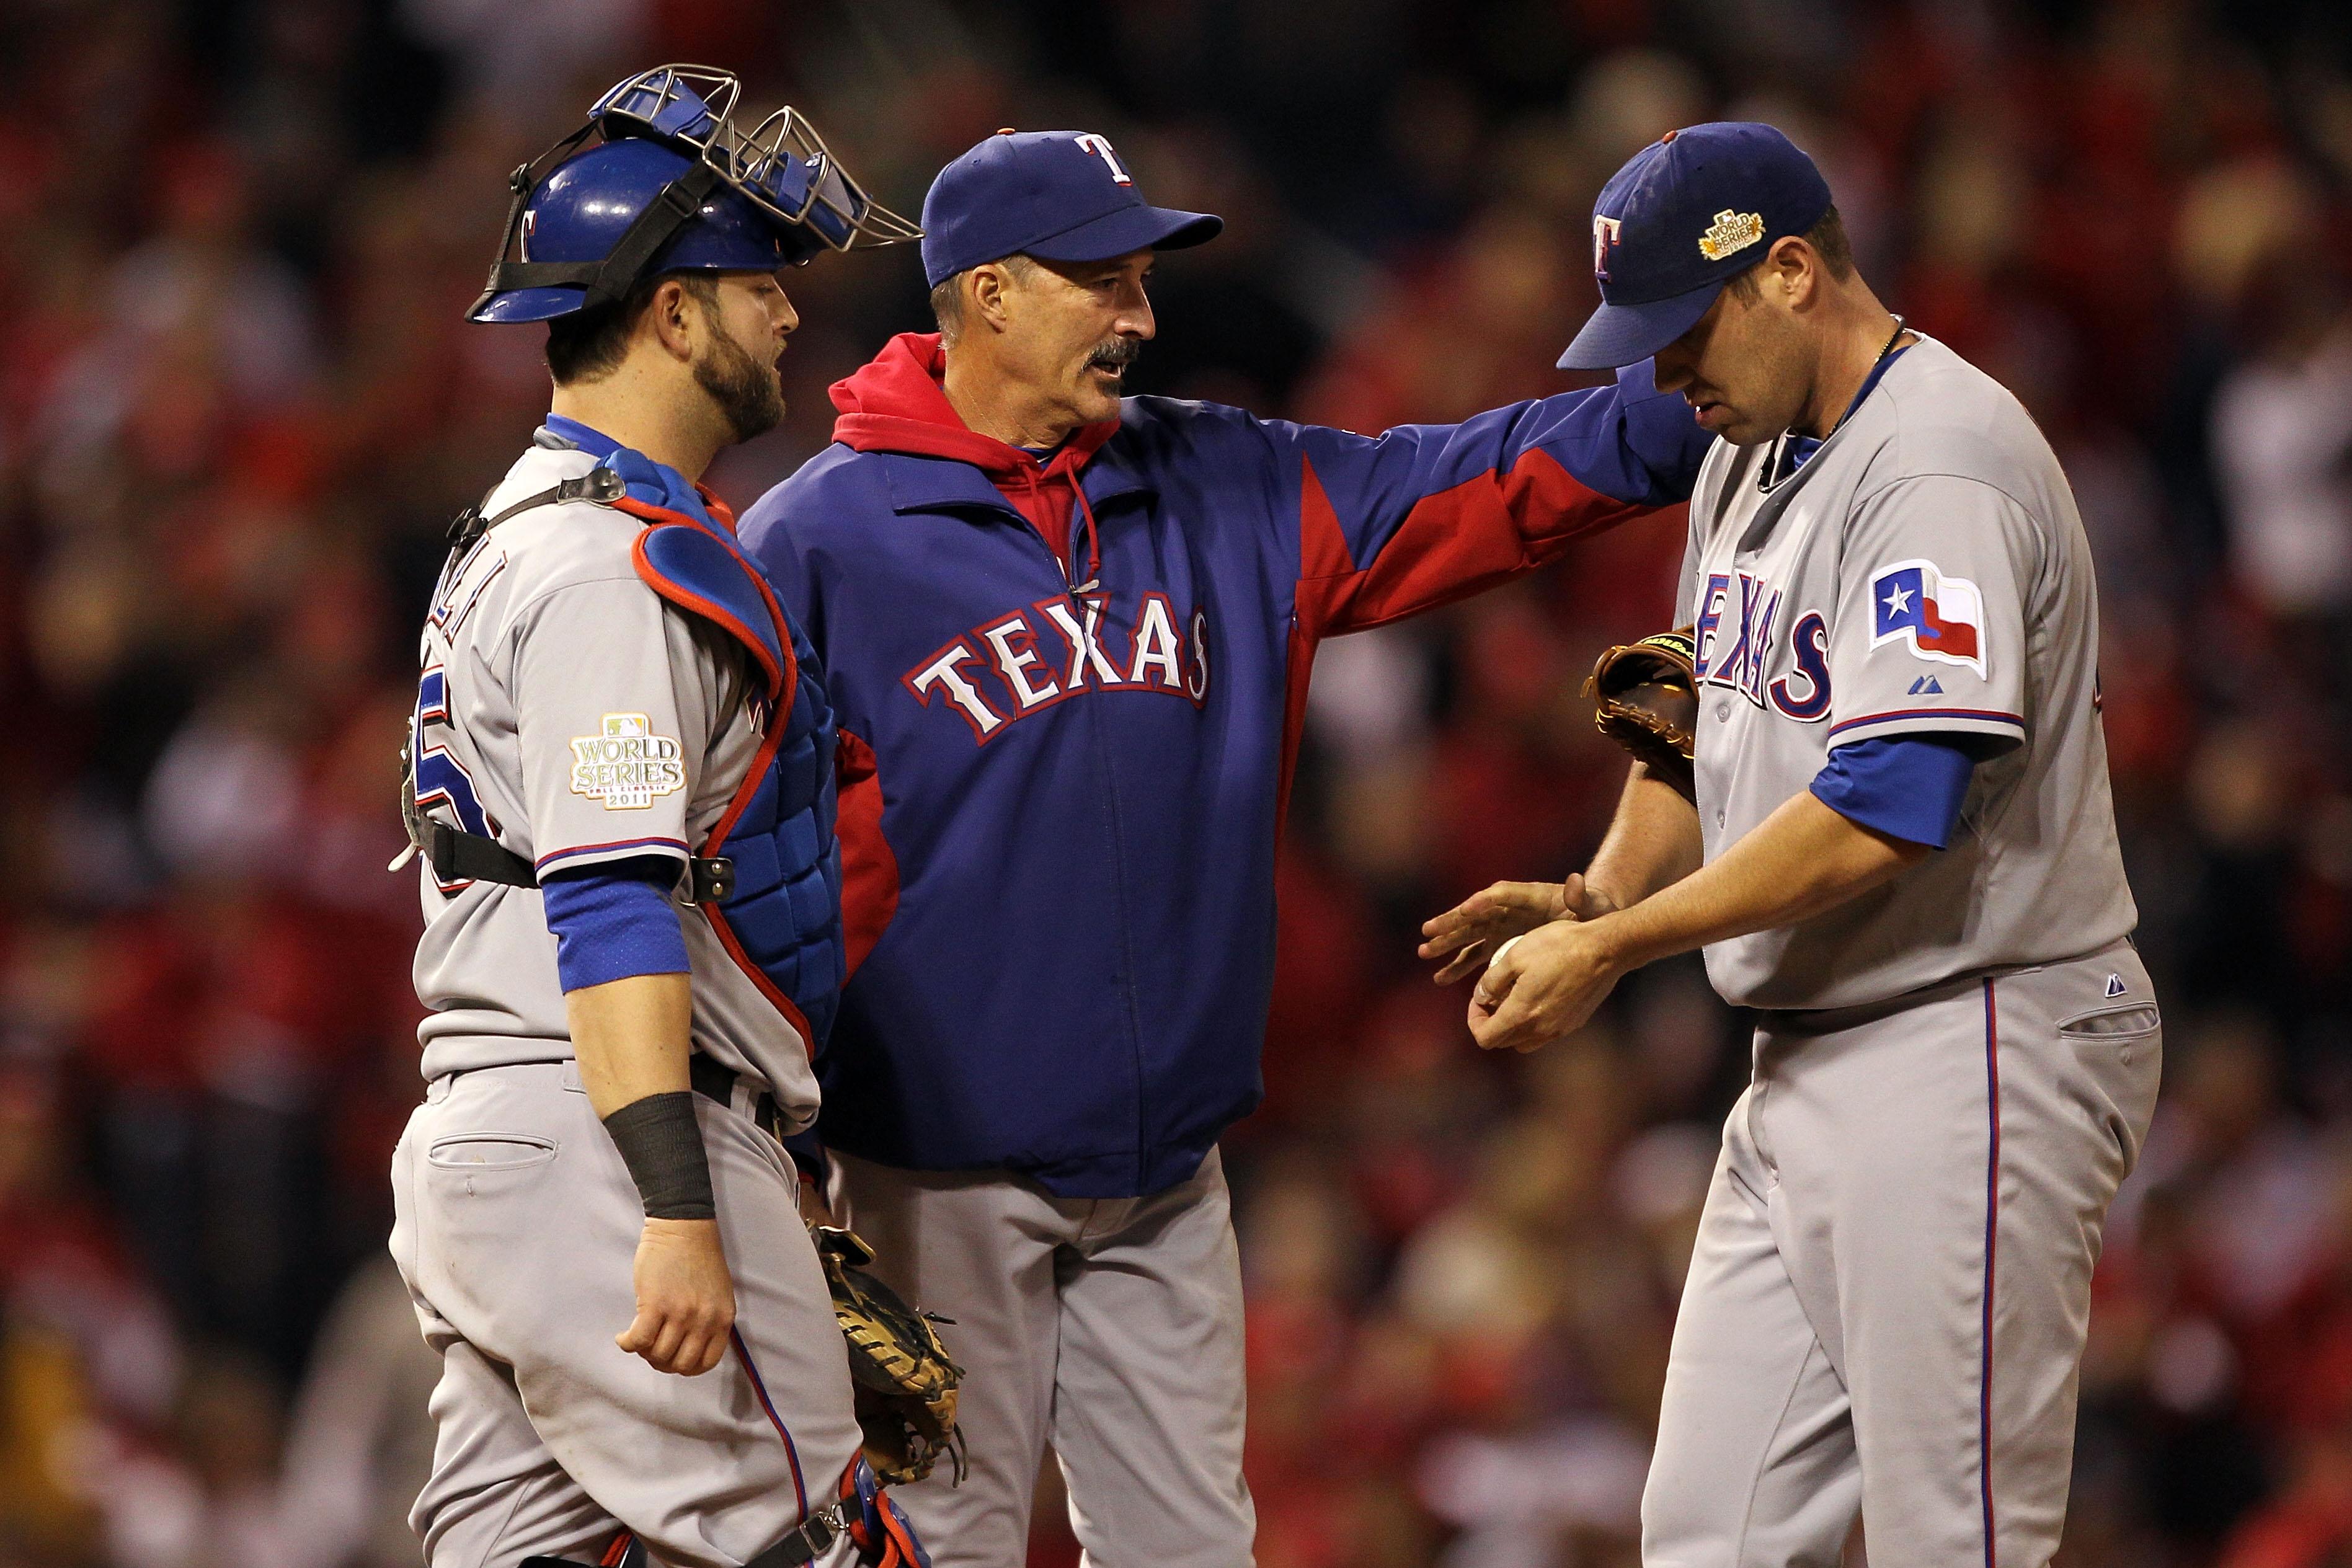 Texas Rangers v St Louis Cardinals - Game 2